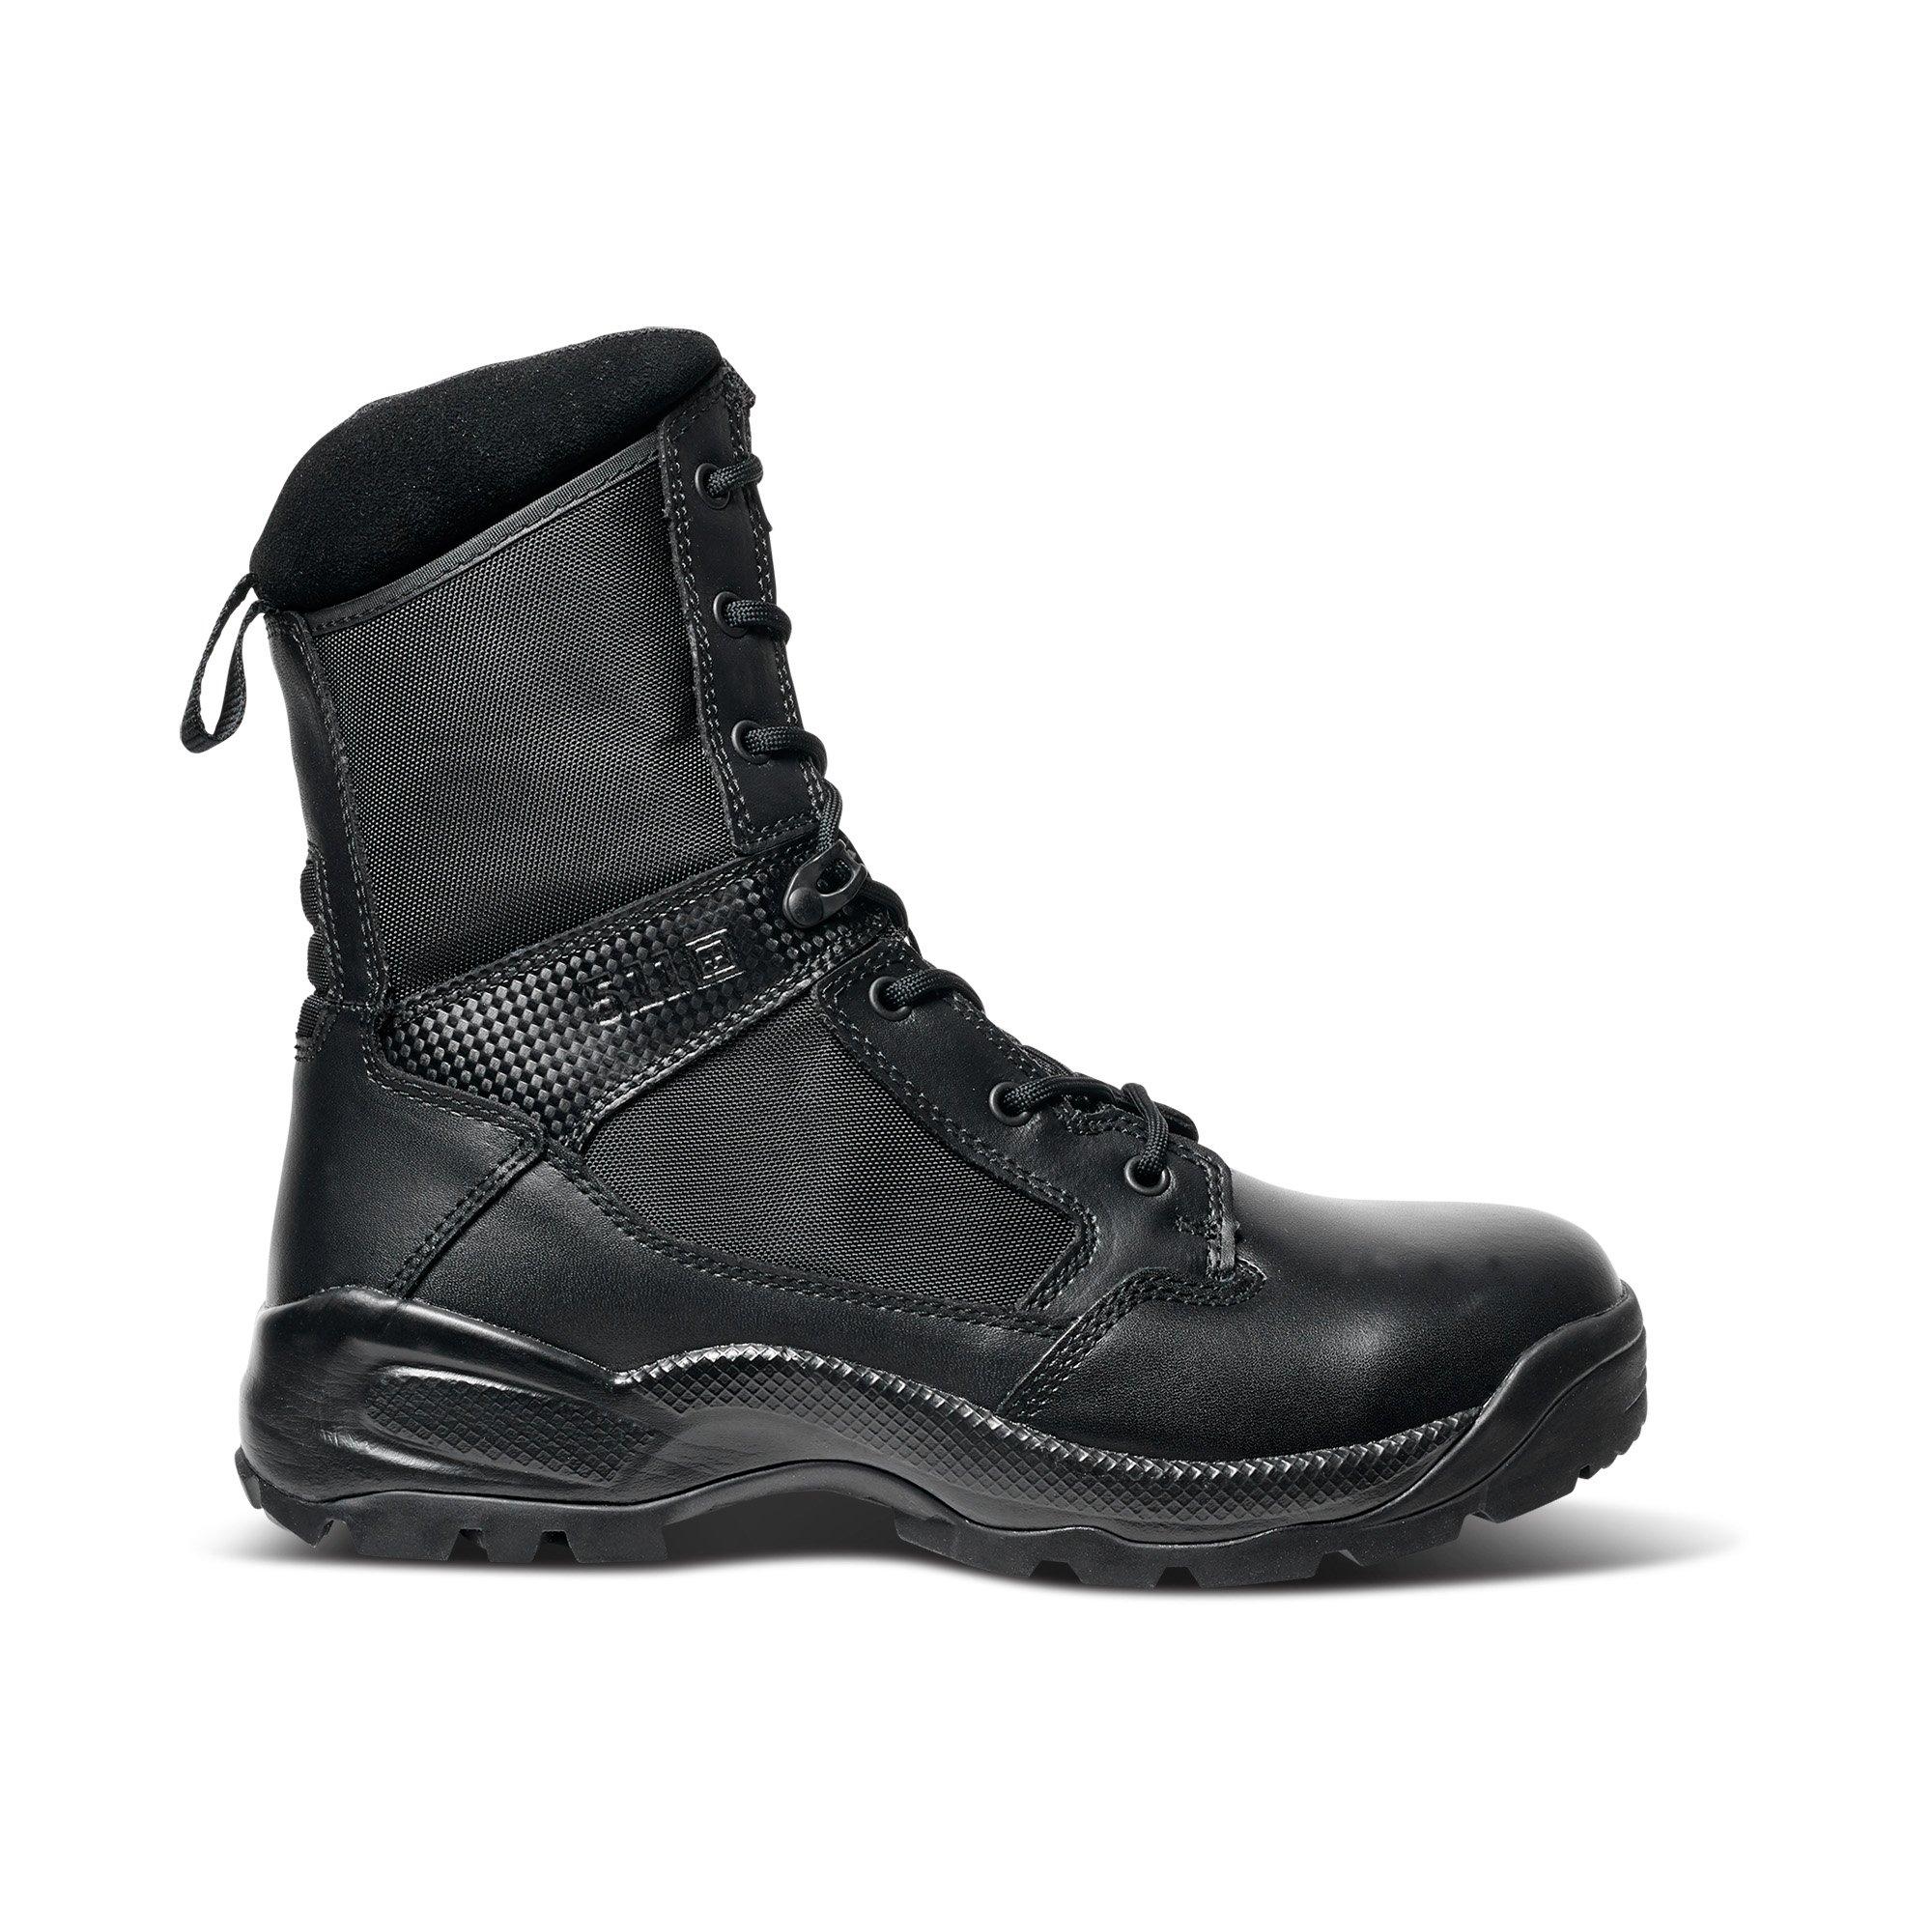 ATAC® 2.0 8″ SIDE ZIP BOOT – Black